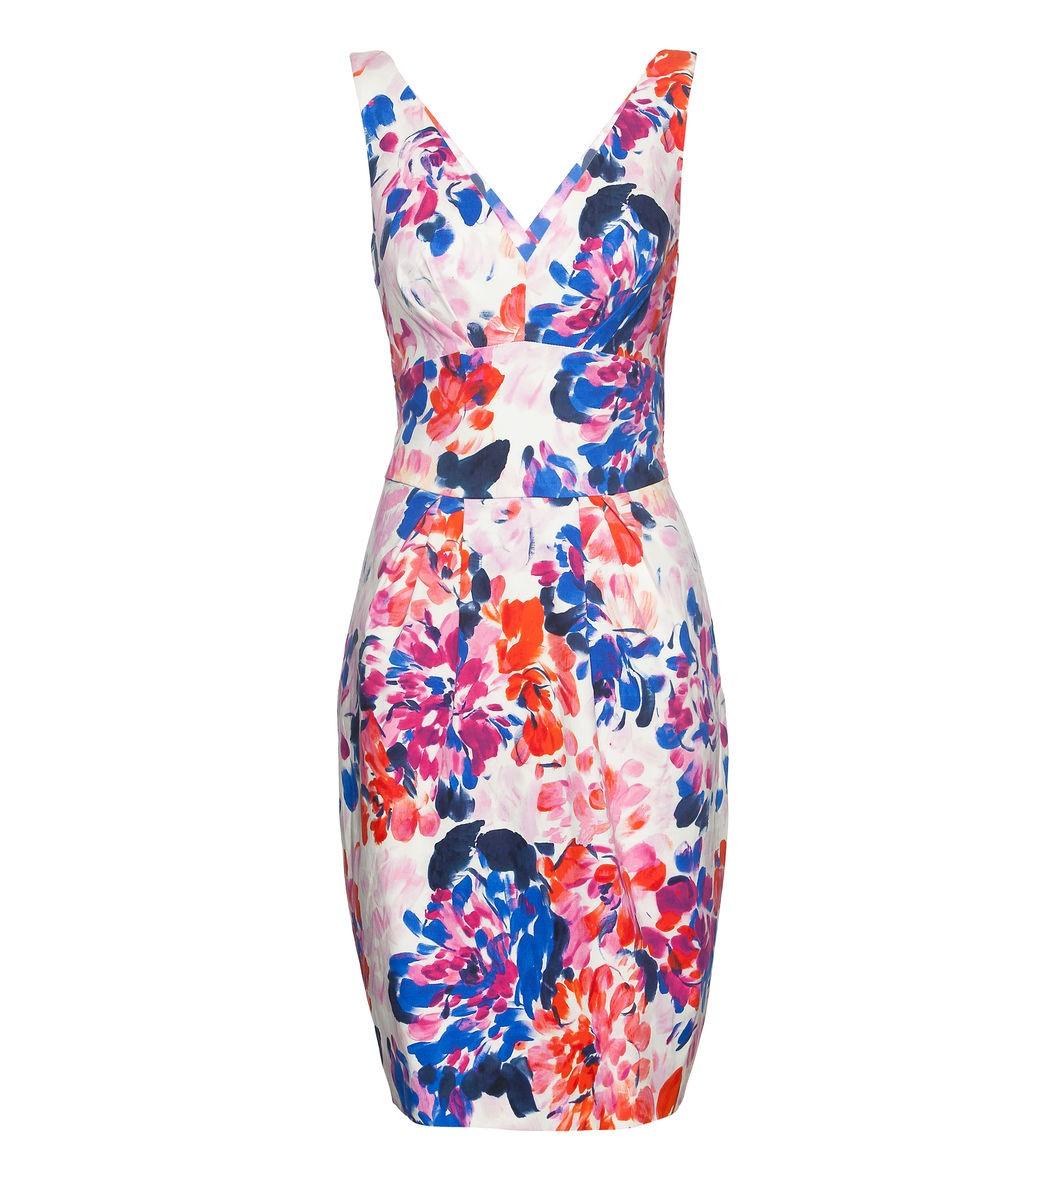 Ms Monte Carlo Dress